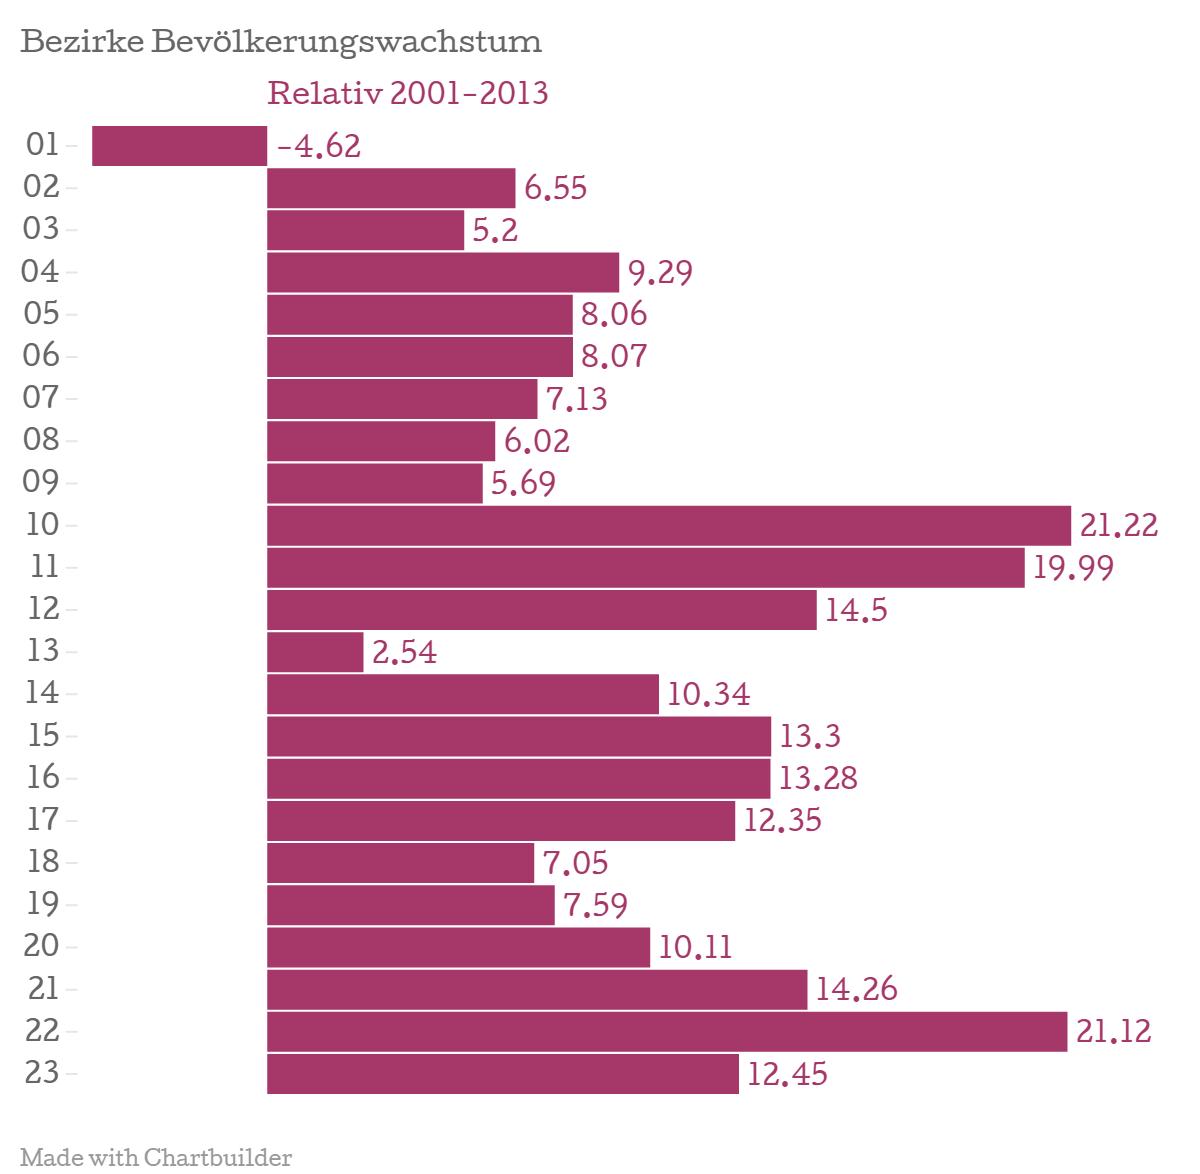 Bezirke-Bev-lkerungswachstum-Relativ-2001-2013_chartbuilder